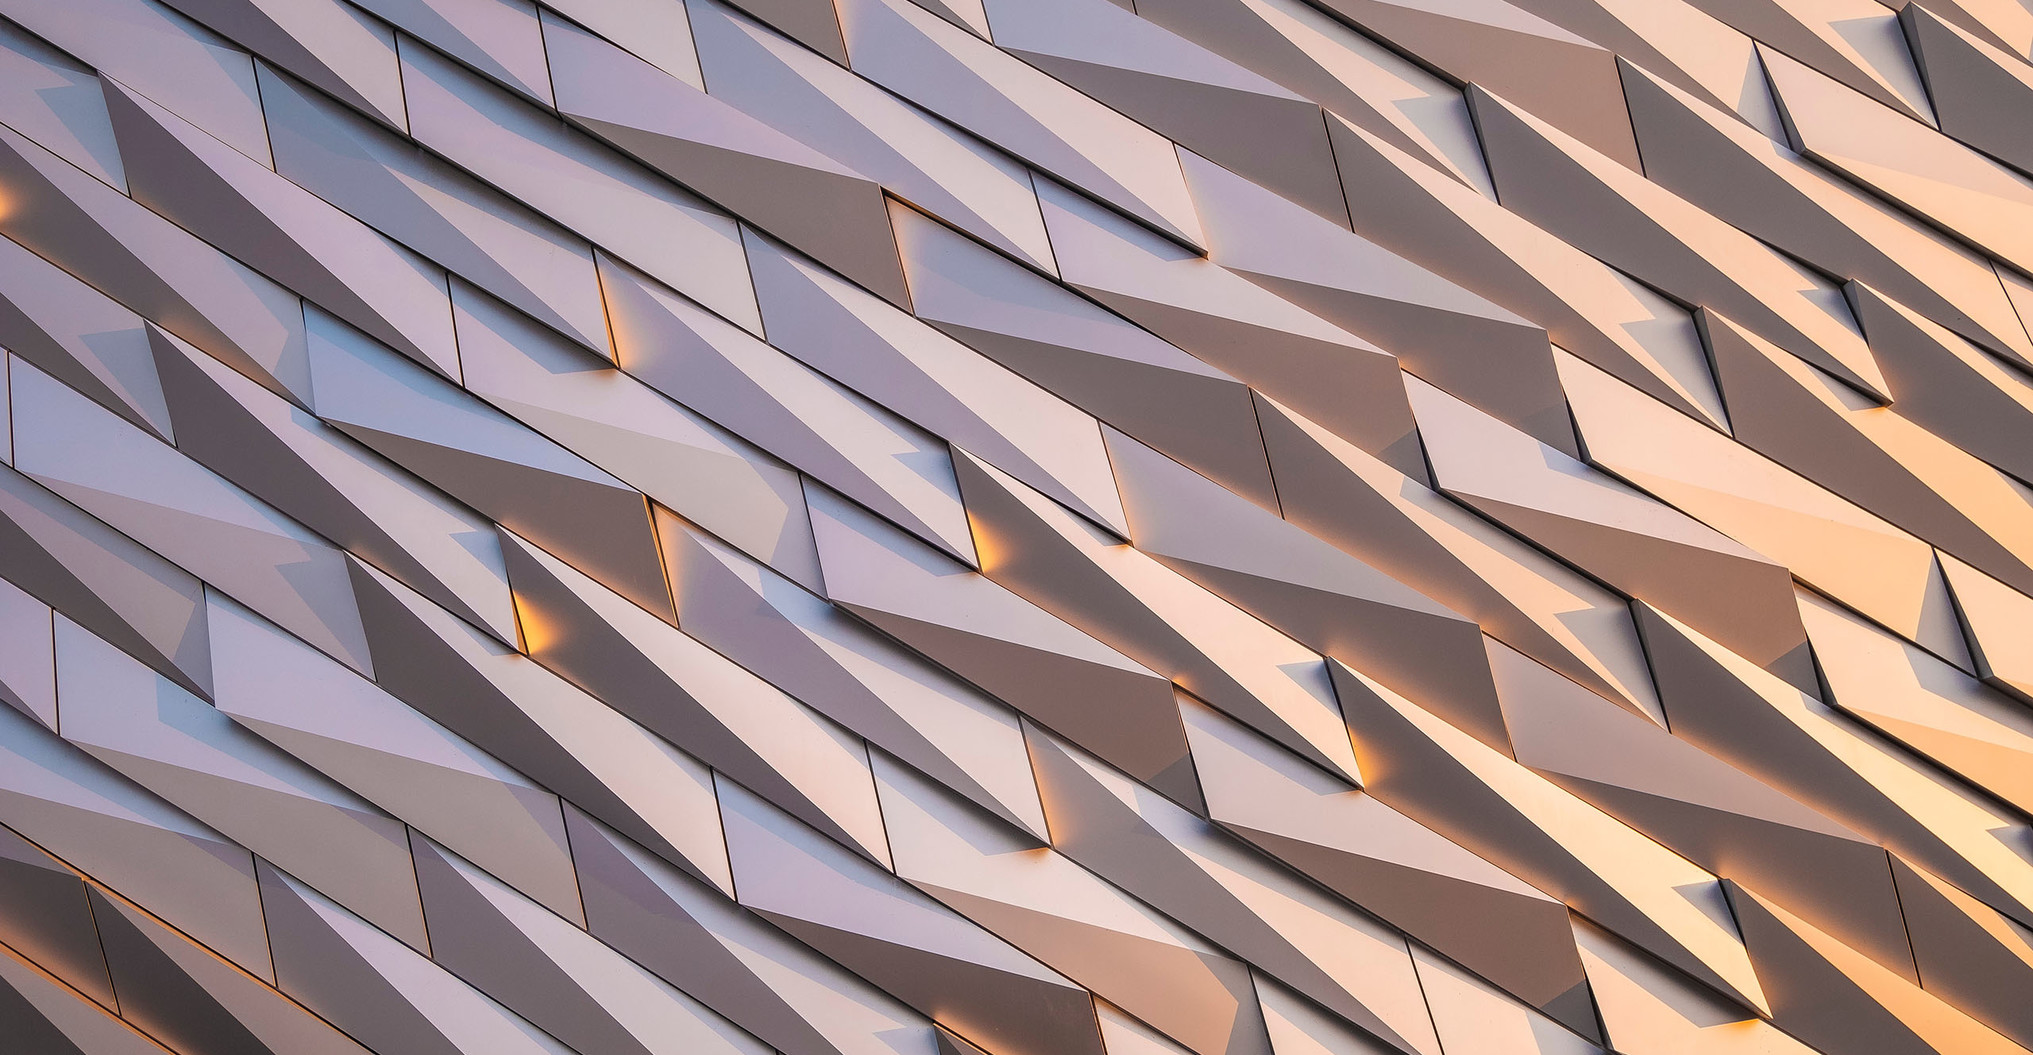 Golden-schimmernde Fassade mit Muster